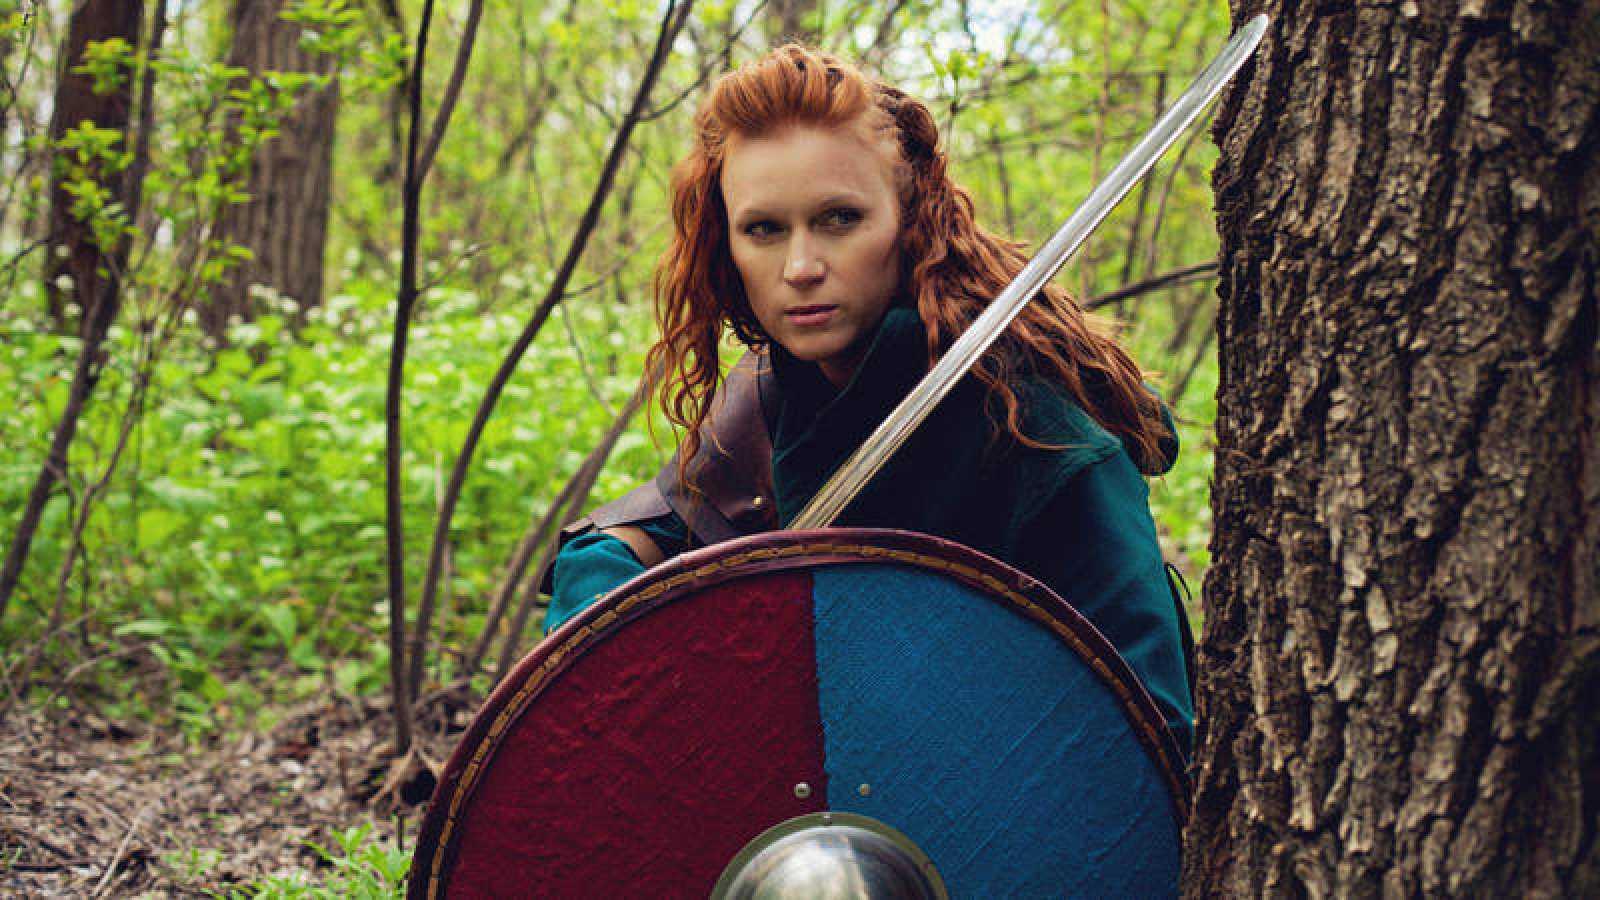 Una mujer caracterizada como una guerrera vikinga